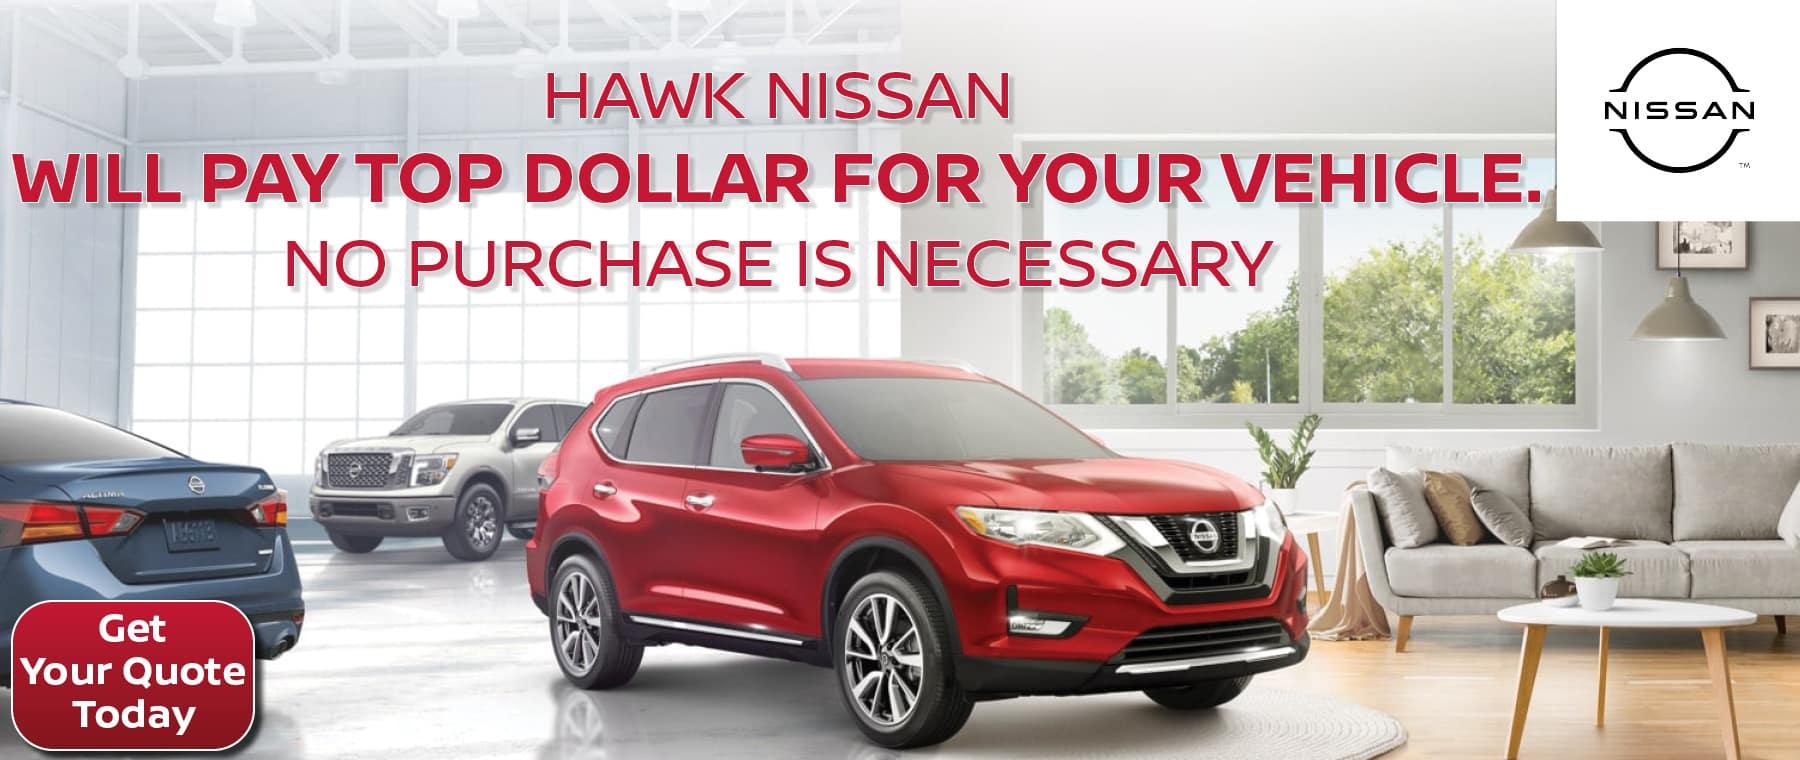 We Buy Cars | Hawk Nissan St. Charles t